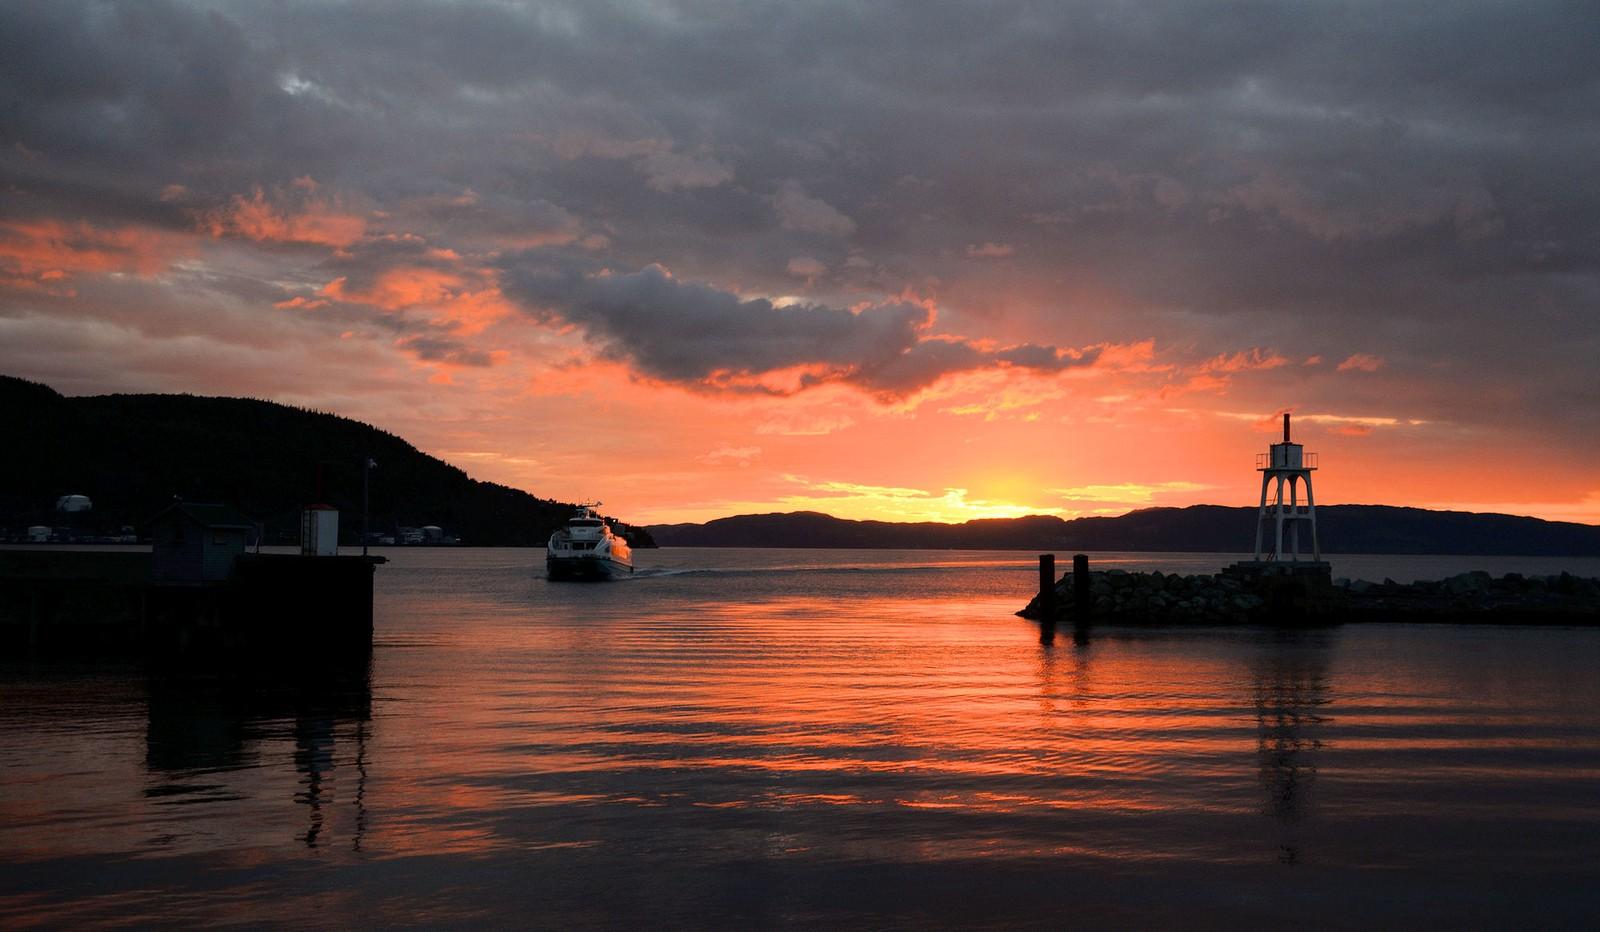 Solnedgang på Brattøra i Trondheim